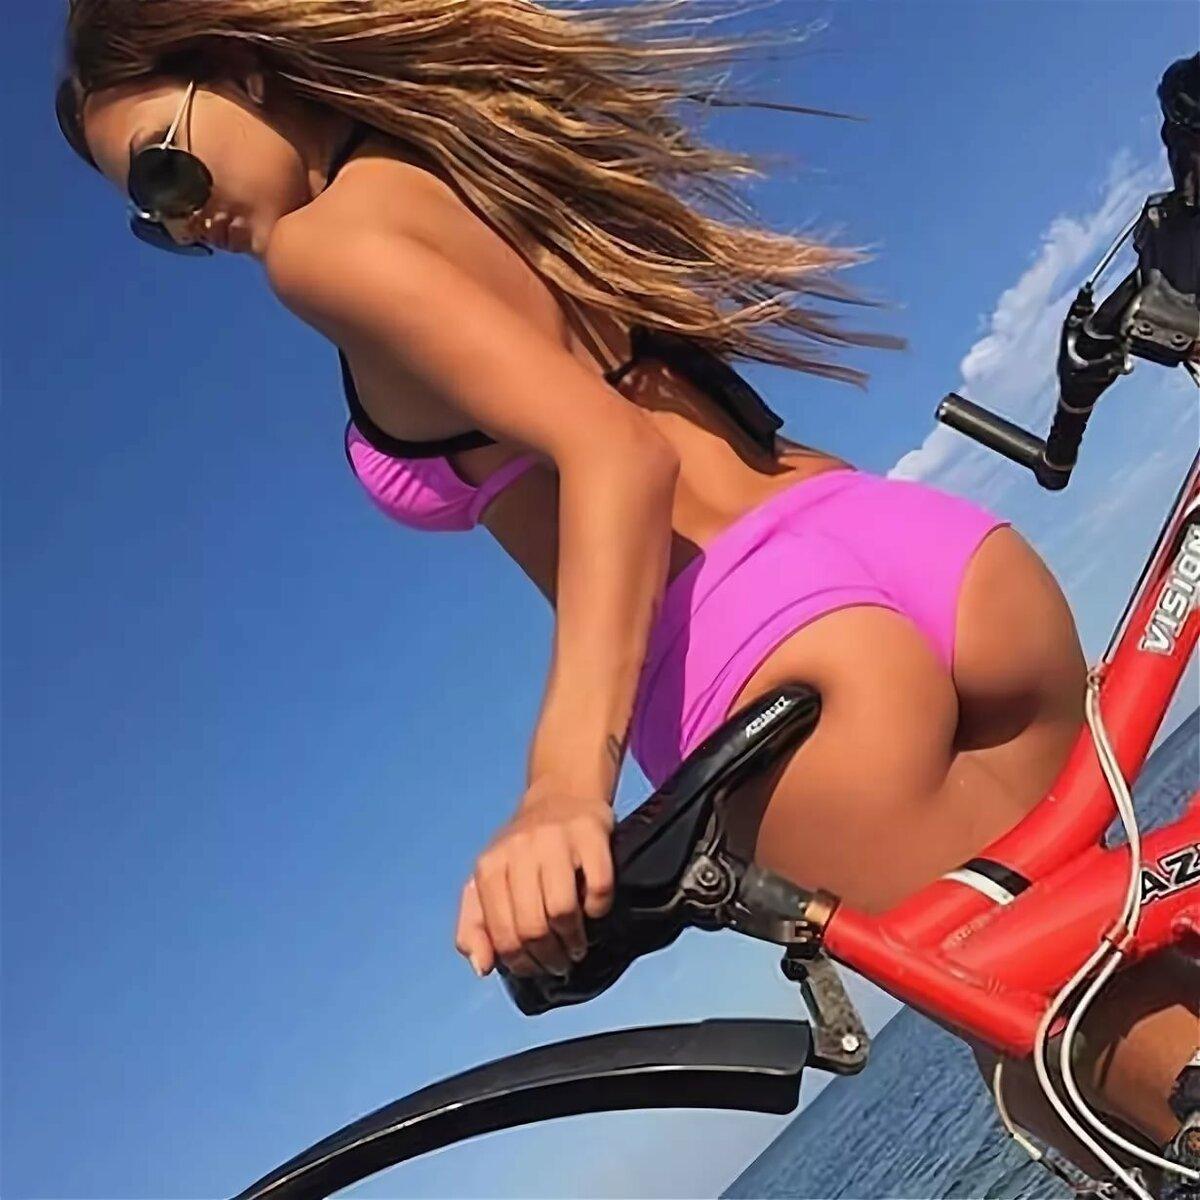 Clit bike